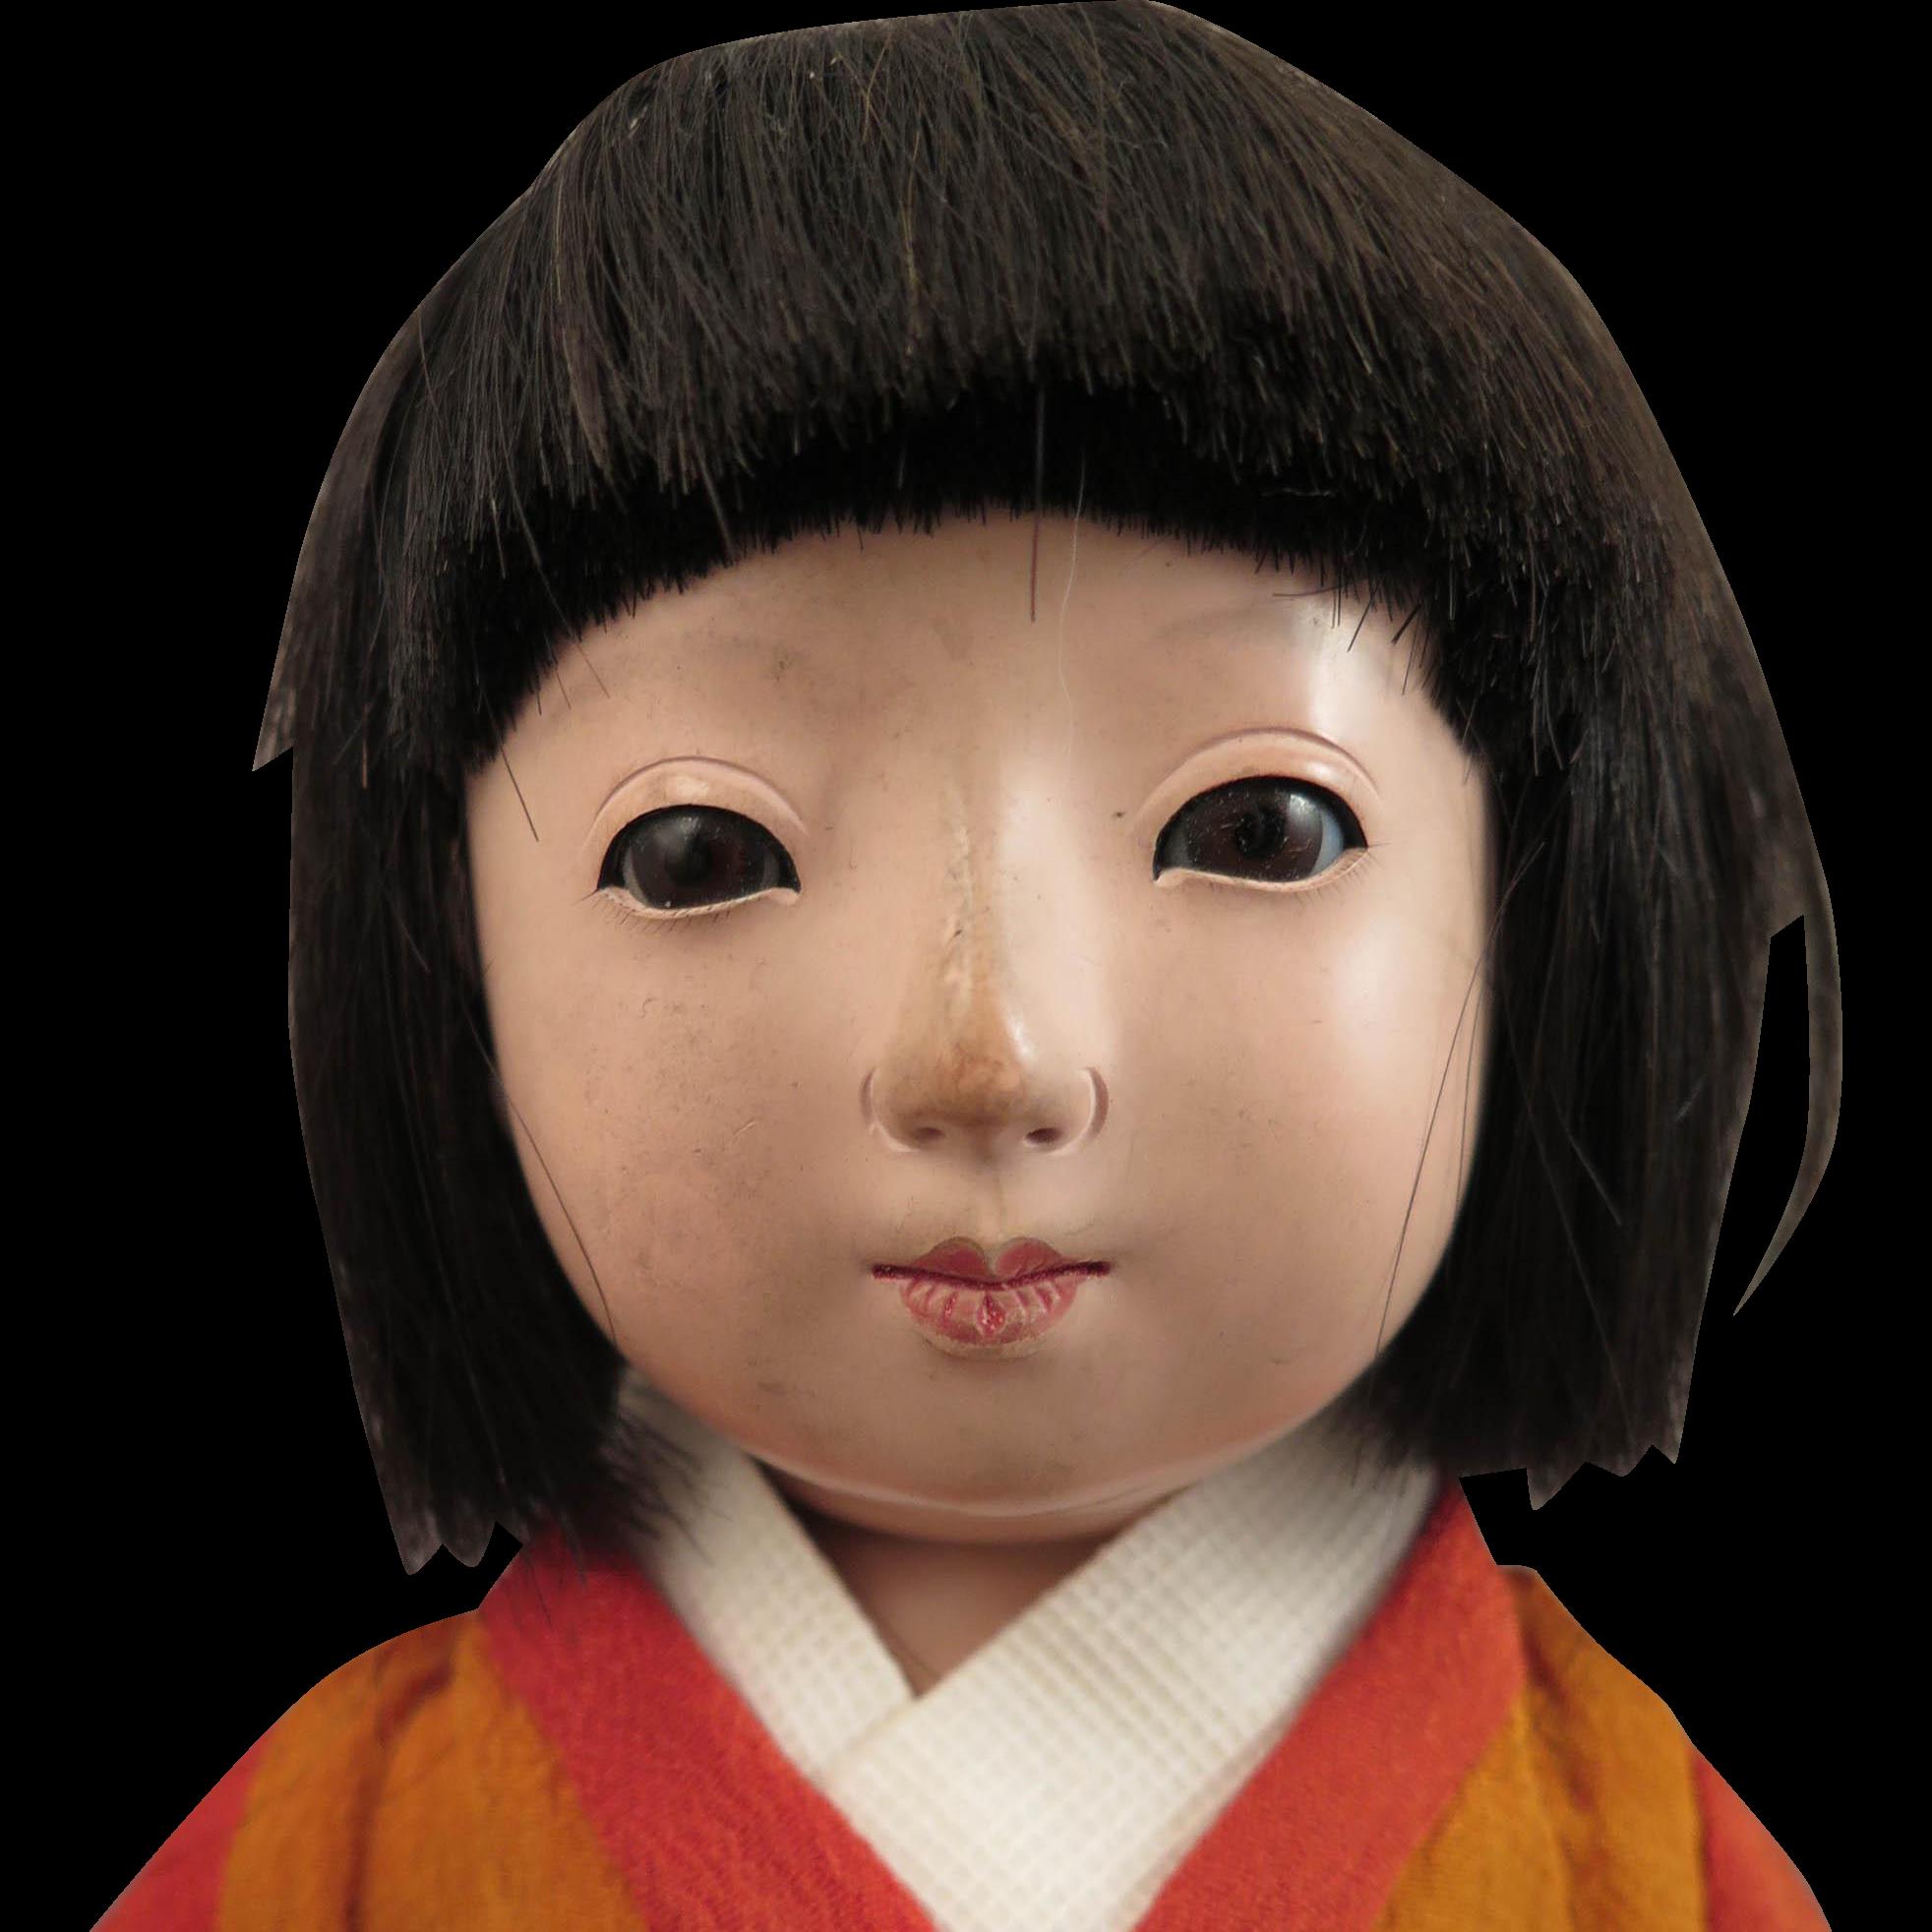 1950s Japanese Ichimatsu Girl Doll 13 inch